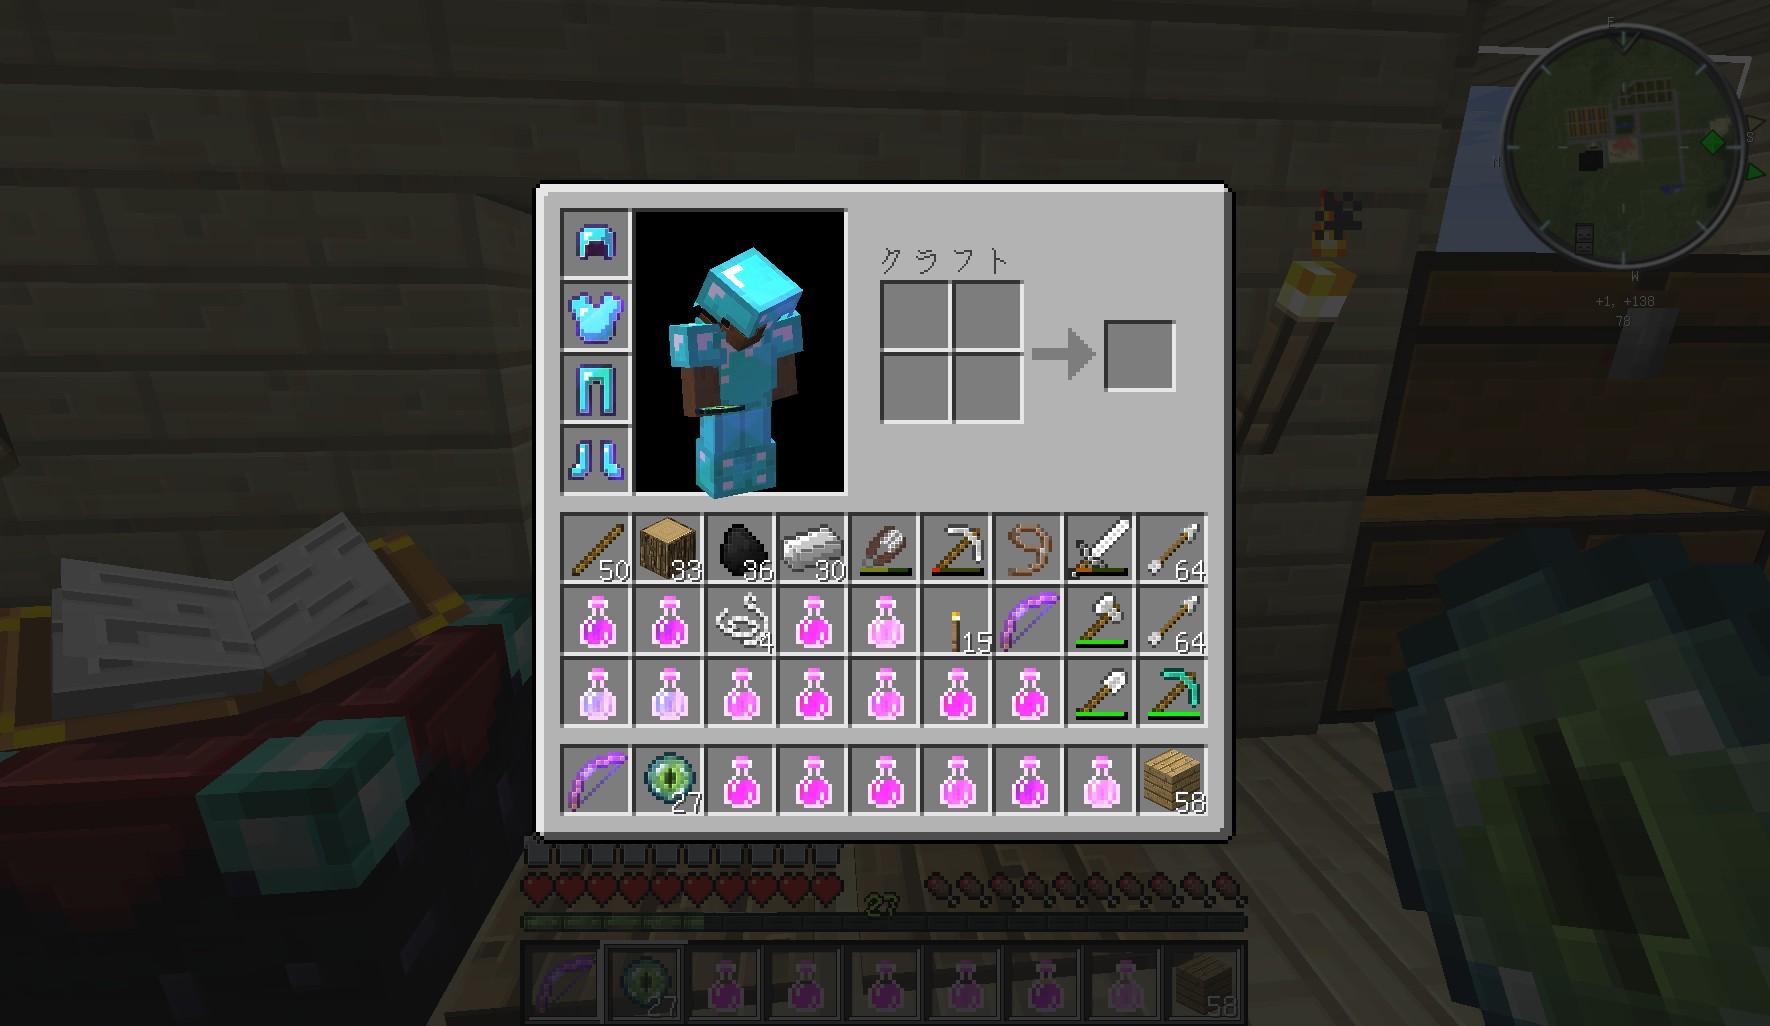 minecraft_26.jpg